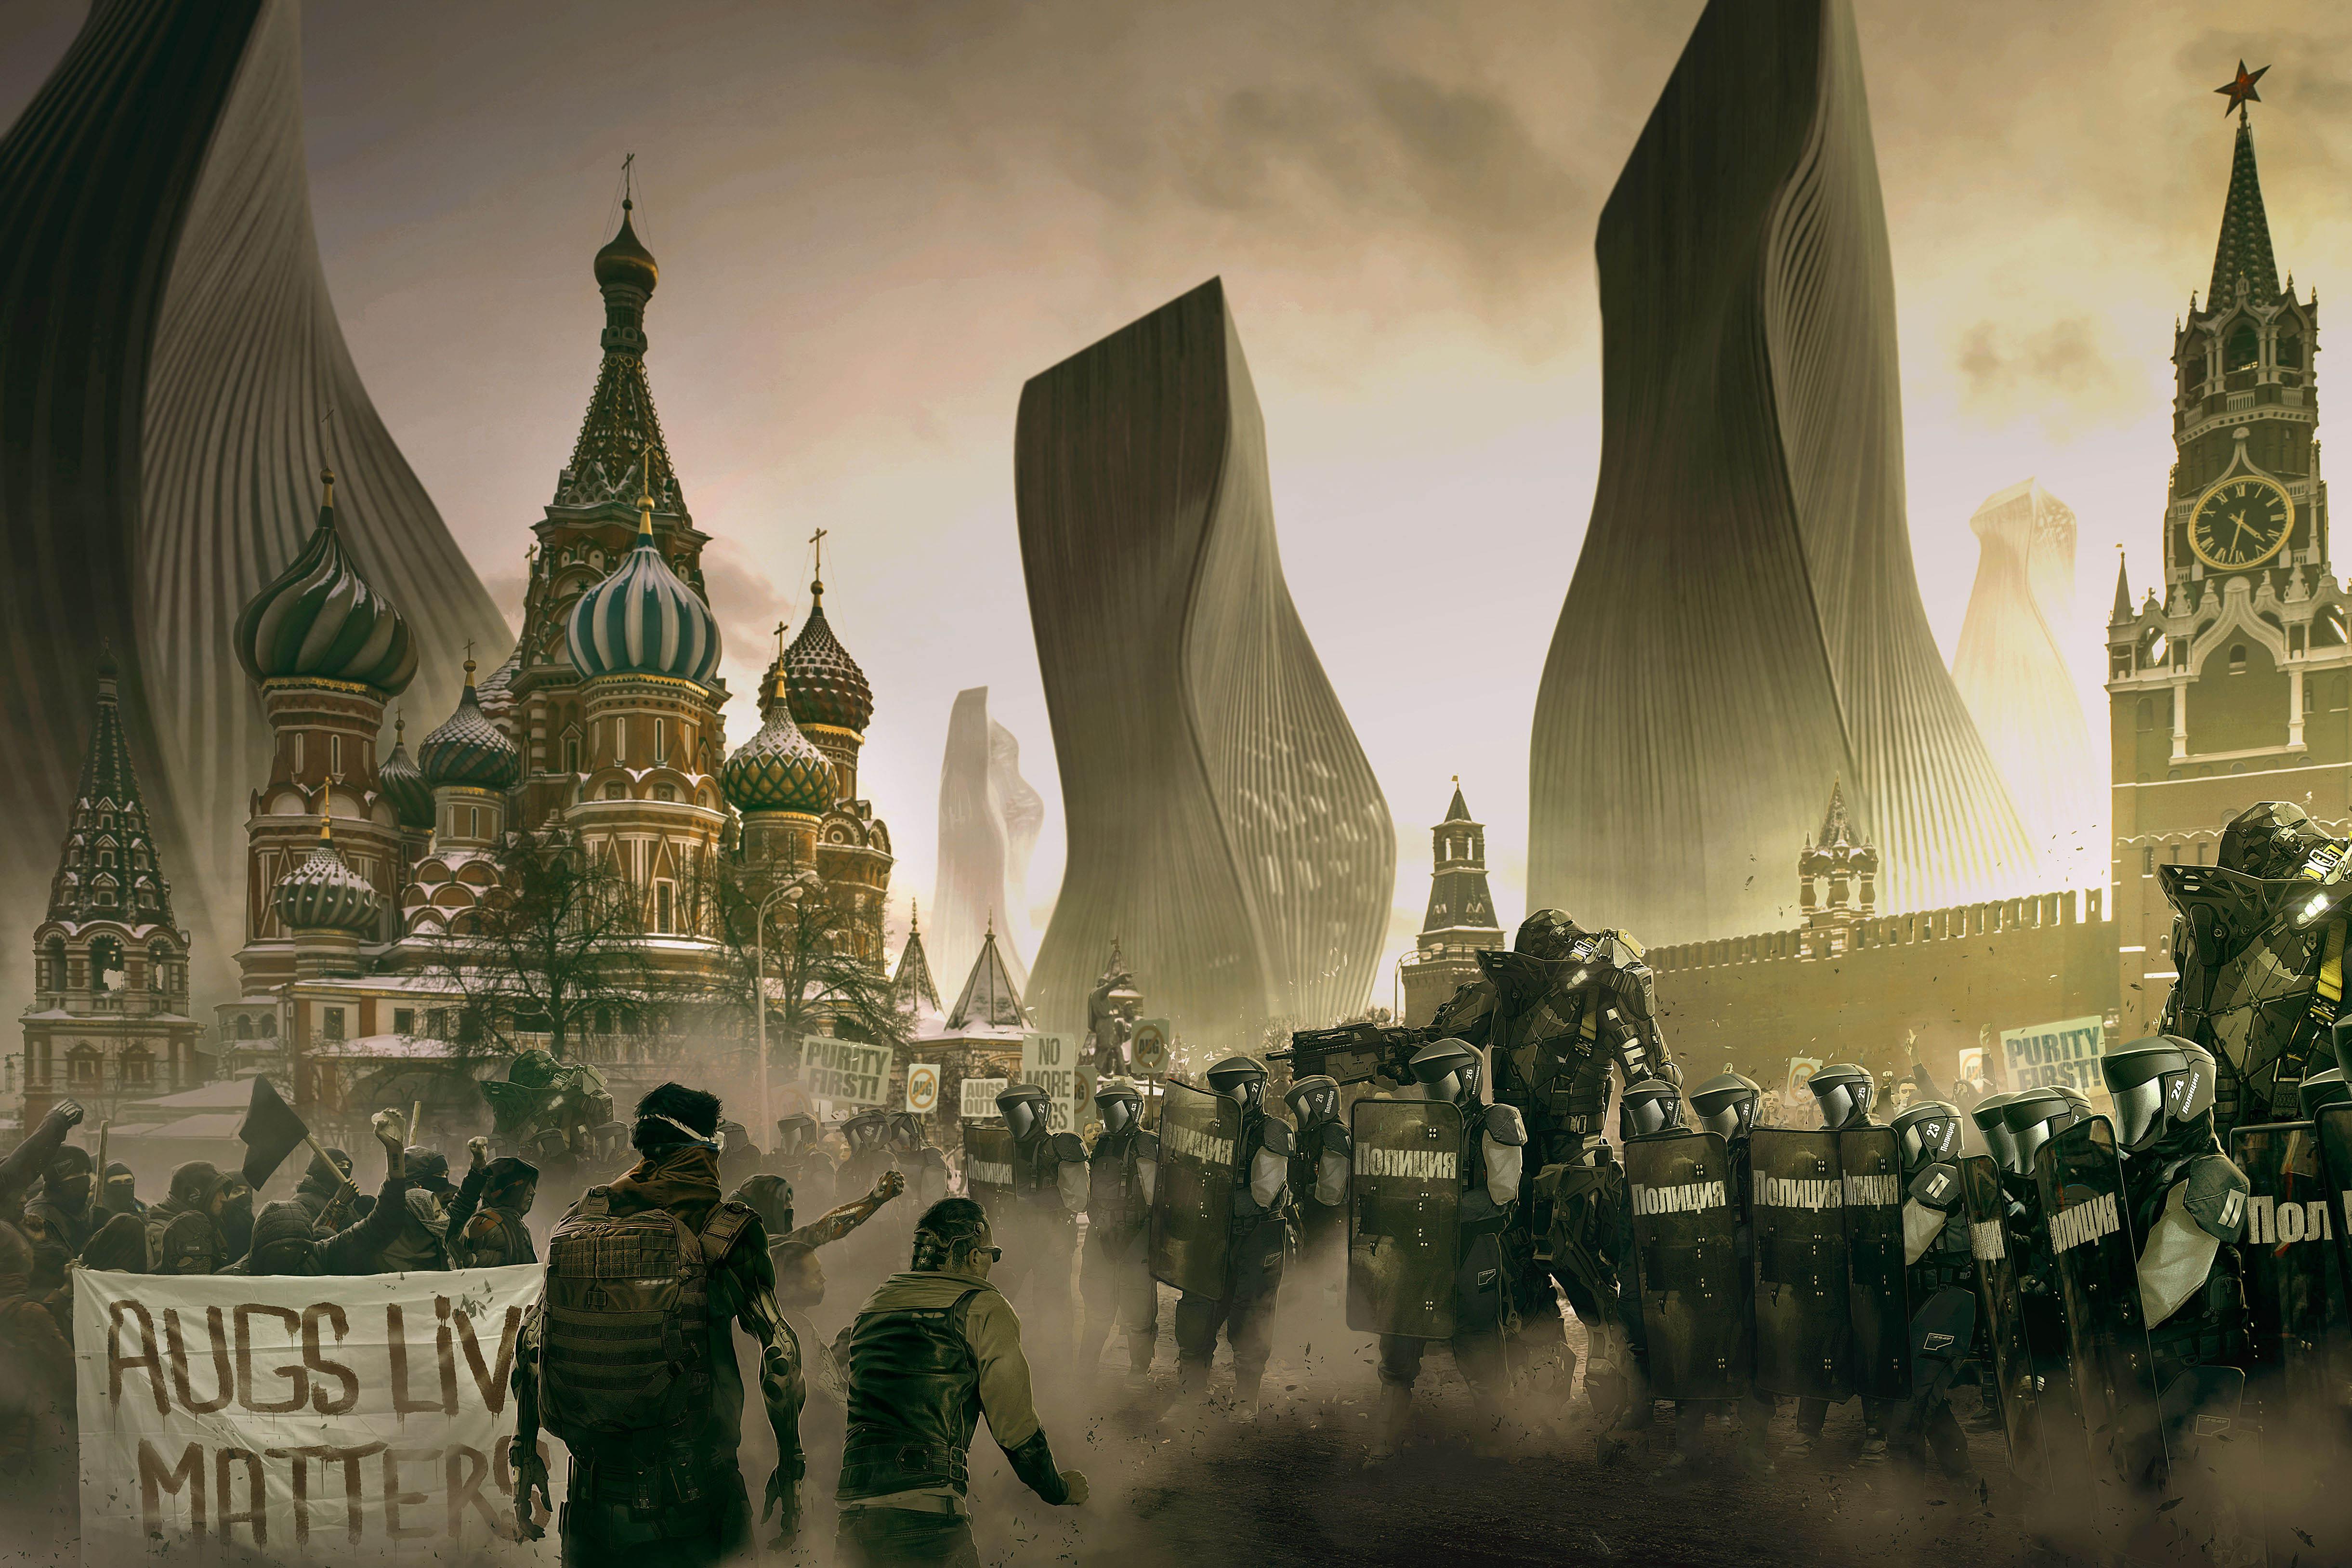 Deus Ex: Mankind Divided Art Features 'Black Lives Matter' Reference